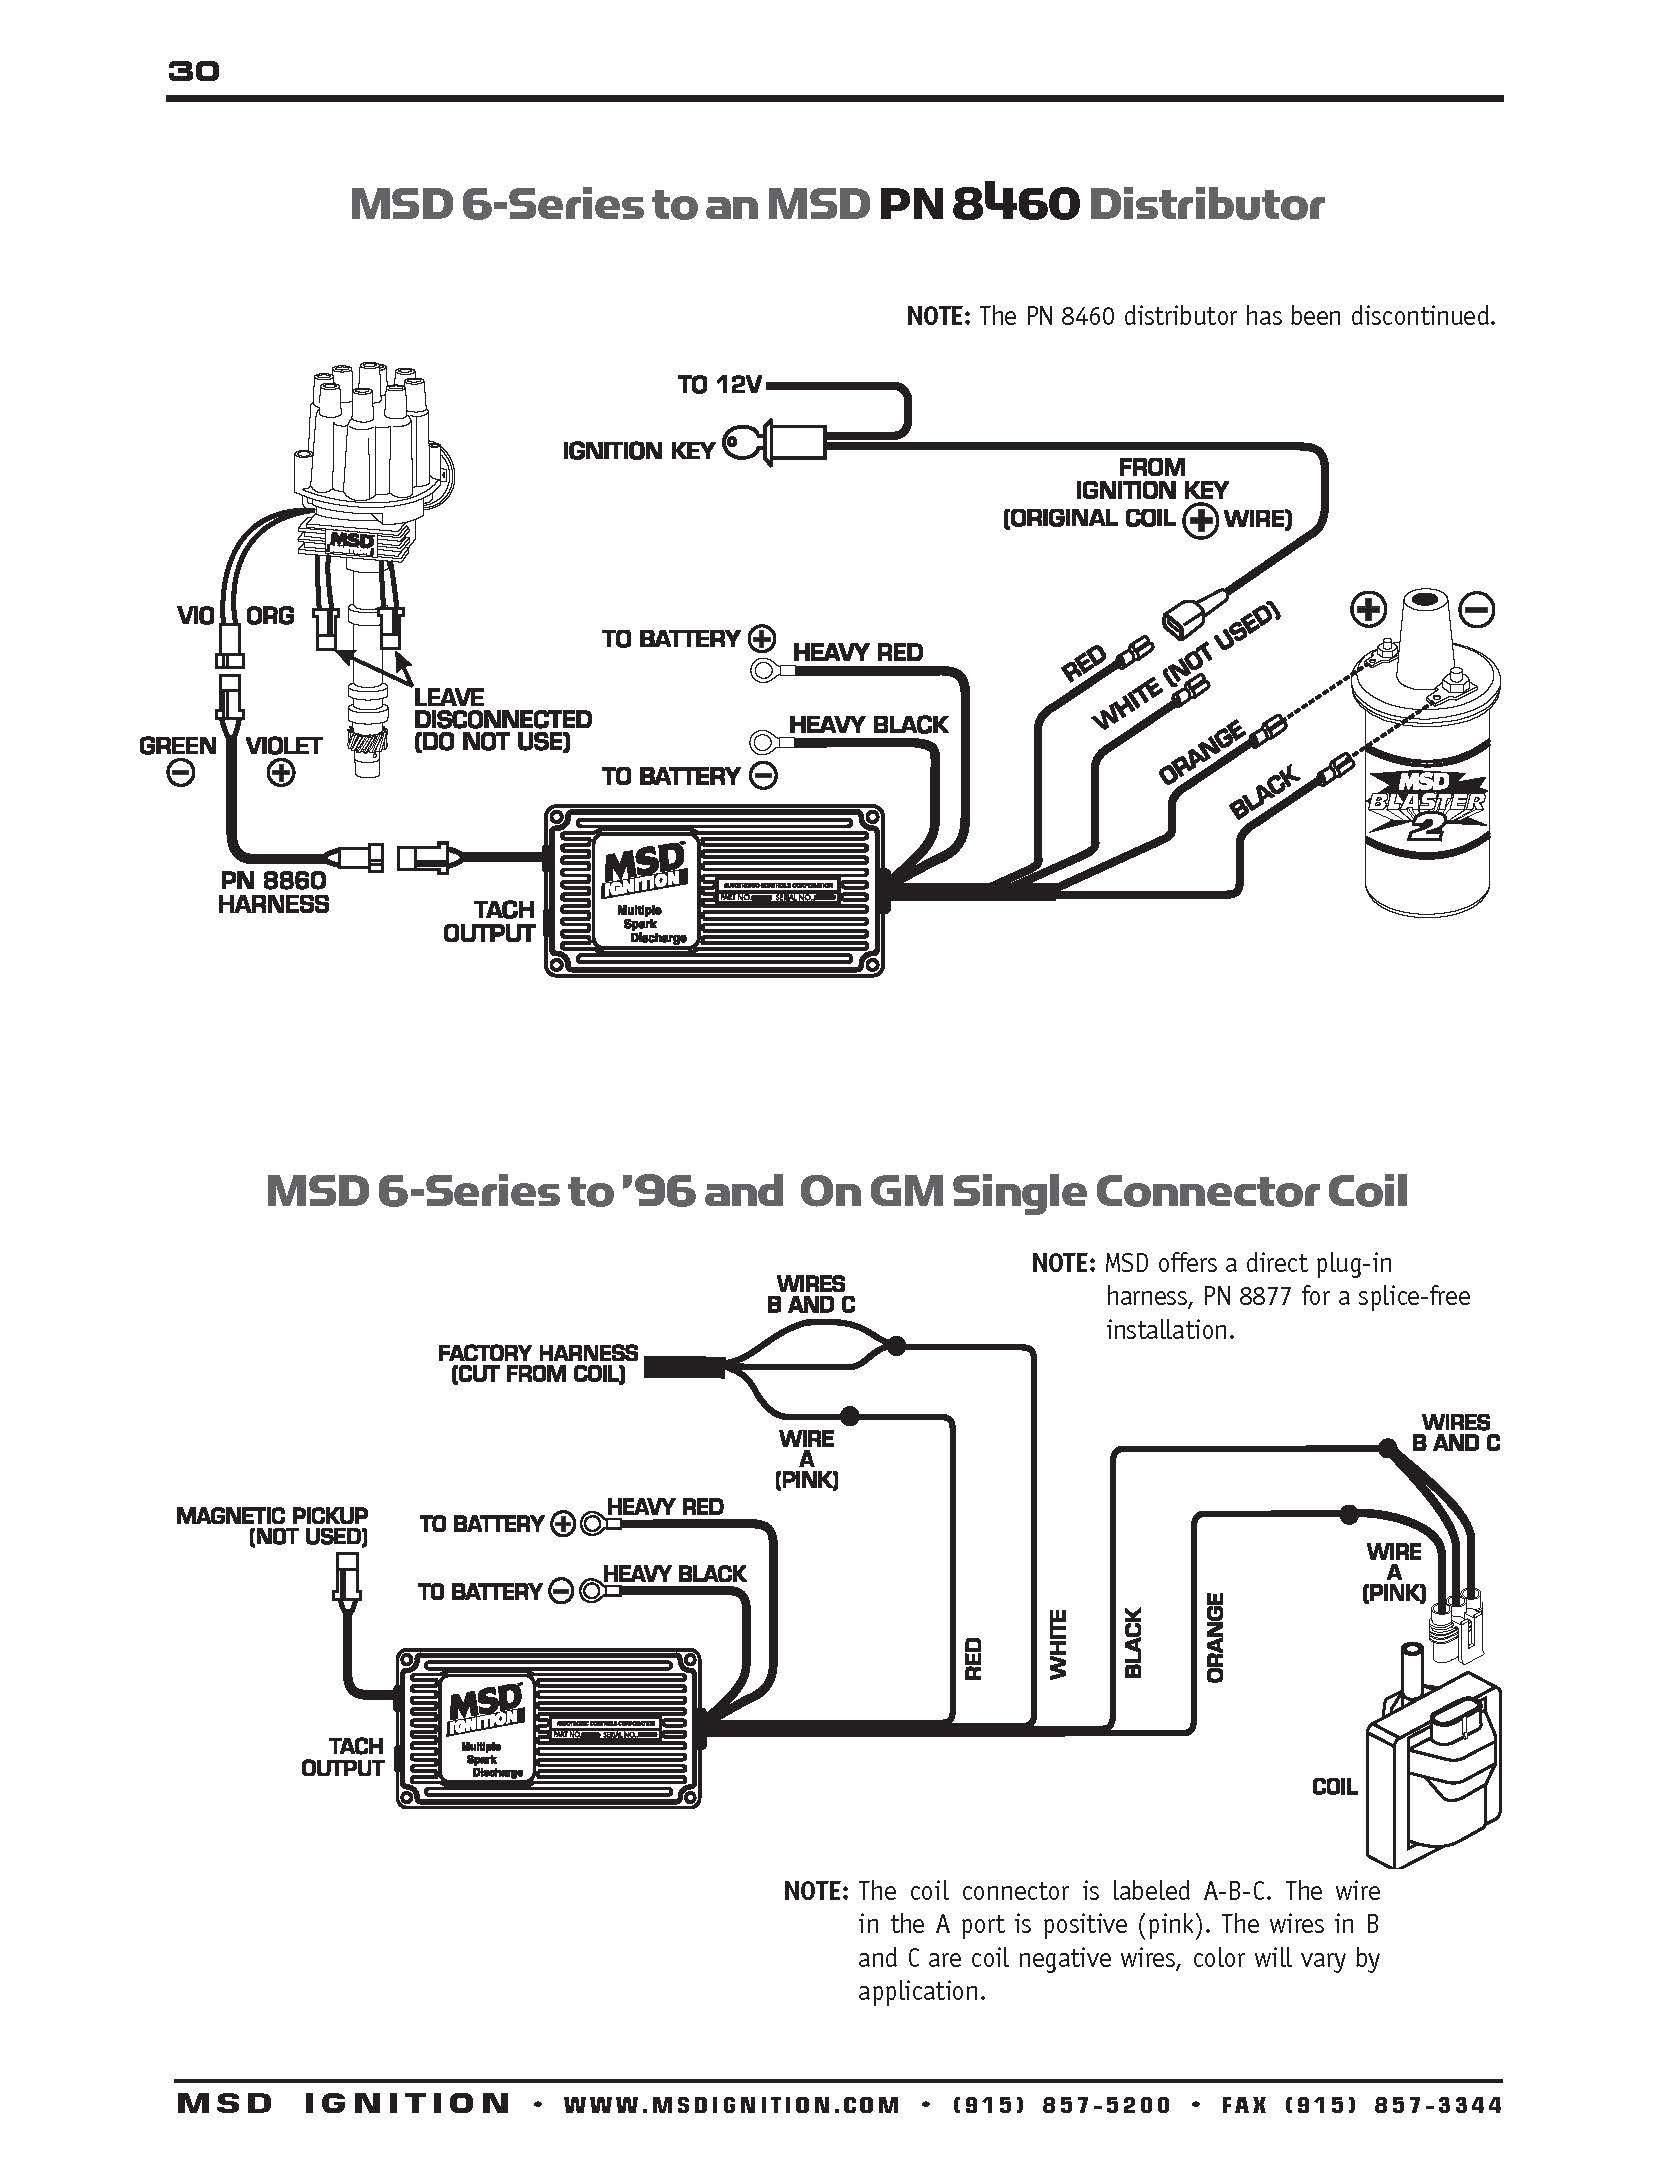 Jeep Hei Wiring - wiring diagrams schematics  Pin Hei Ignition Module Wiring Diagram on